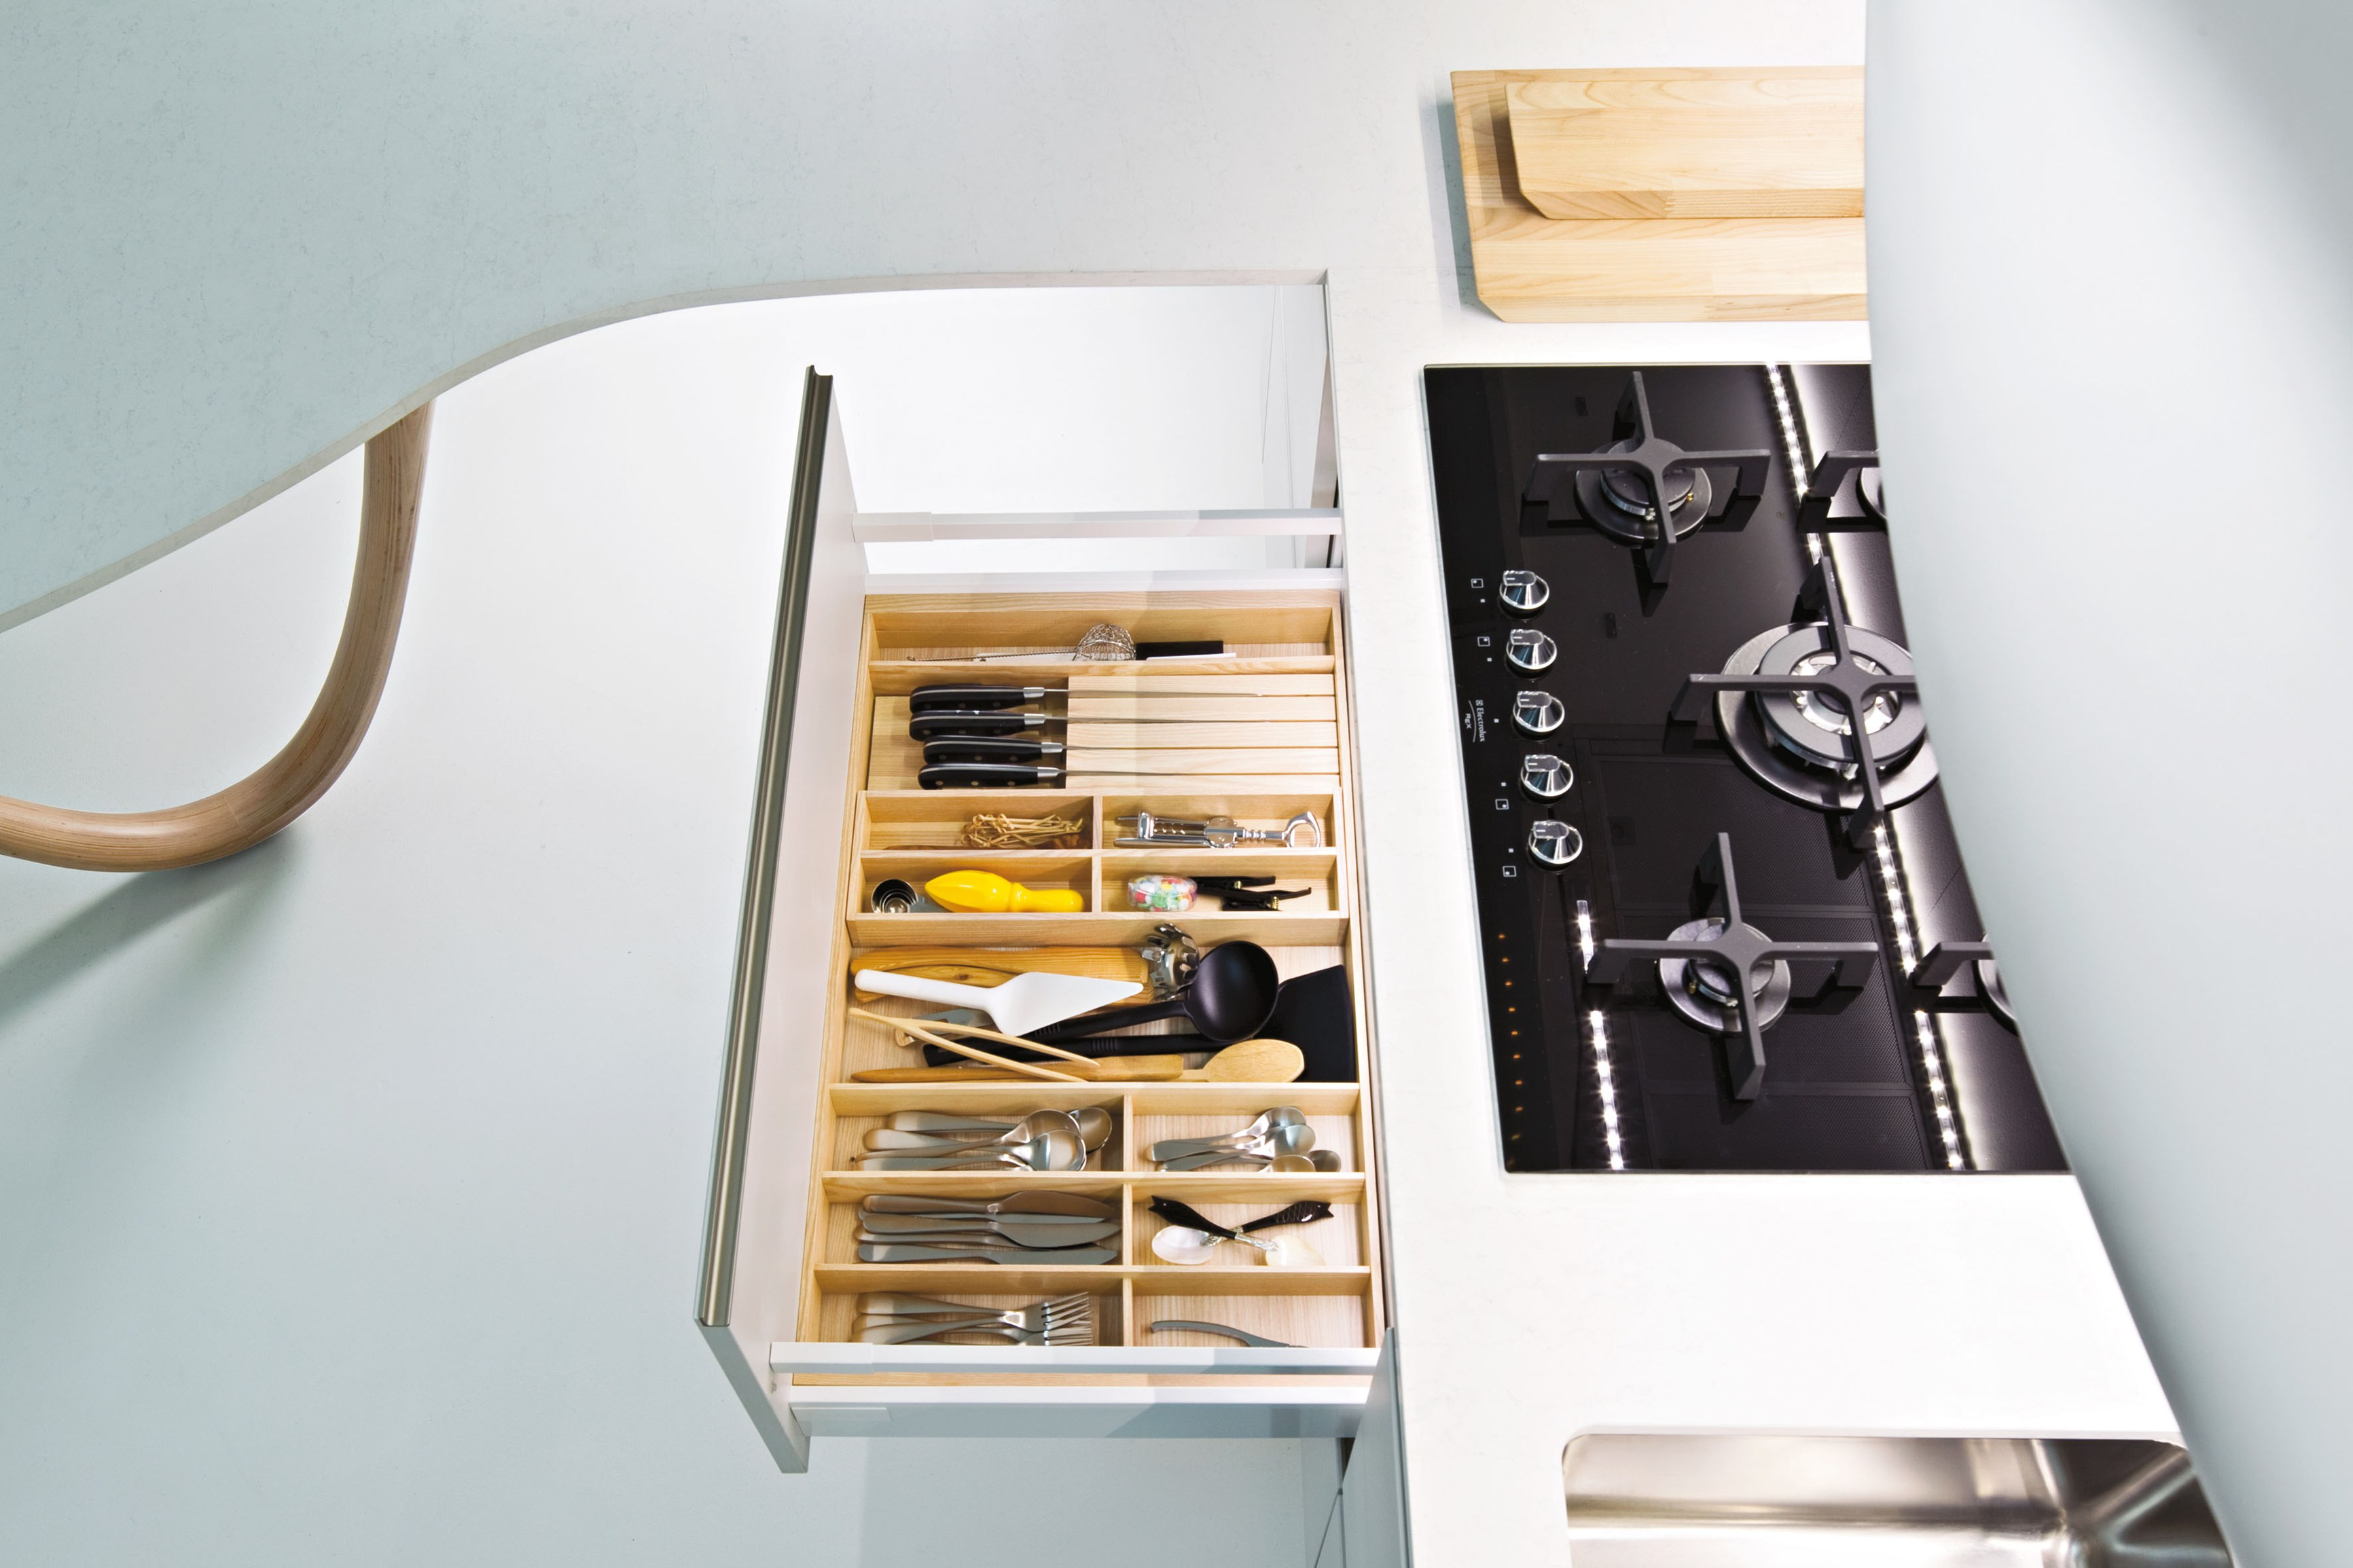 Ola 20 cucina con penisola by snaidero design pininfarina - Cucina ola 20 snaidero ...